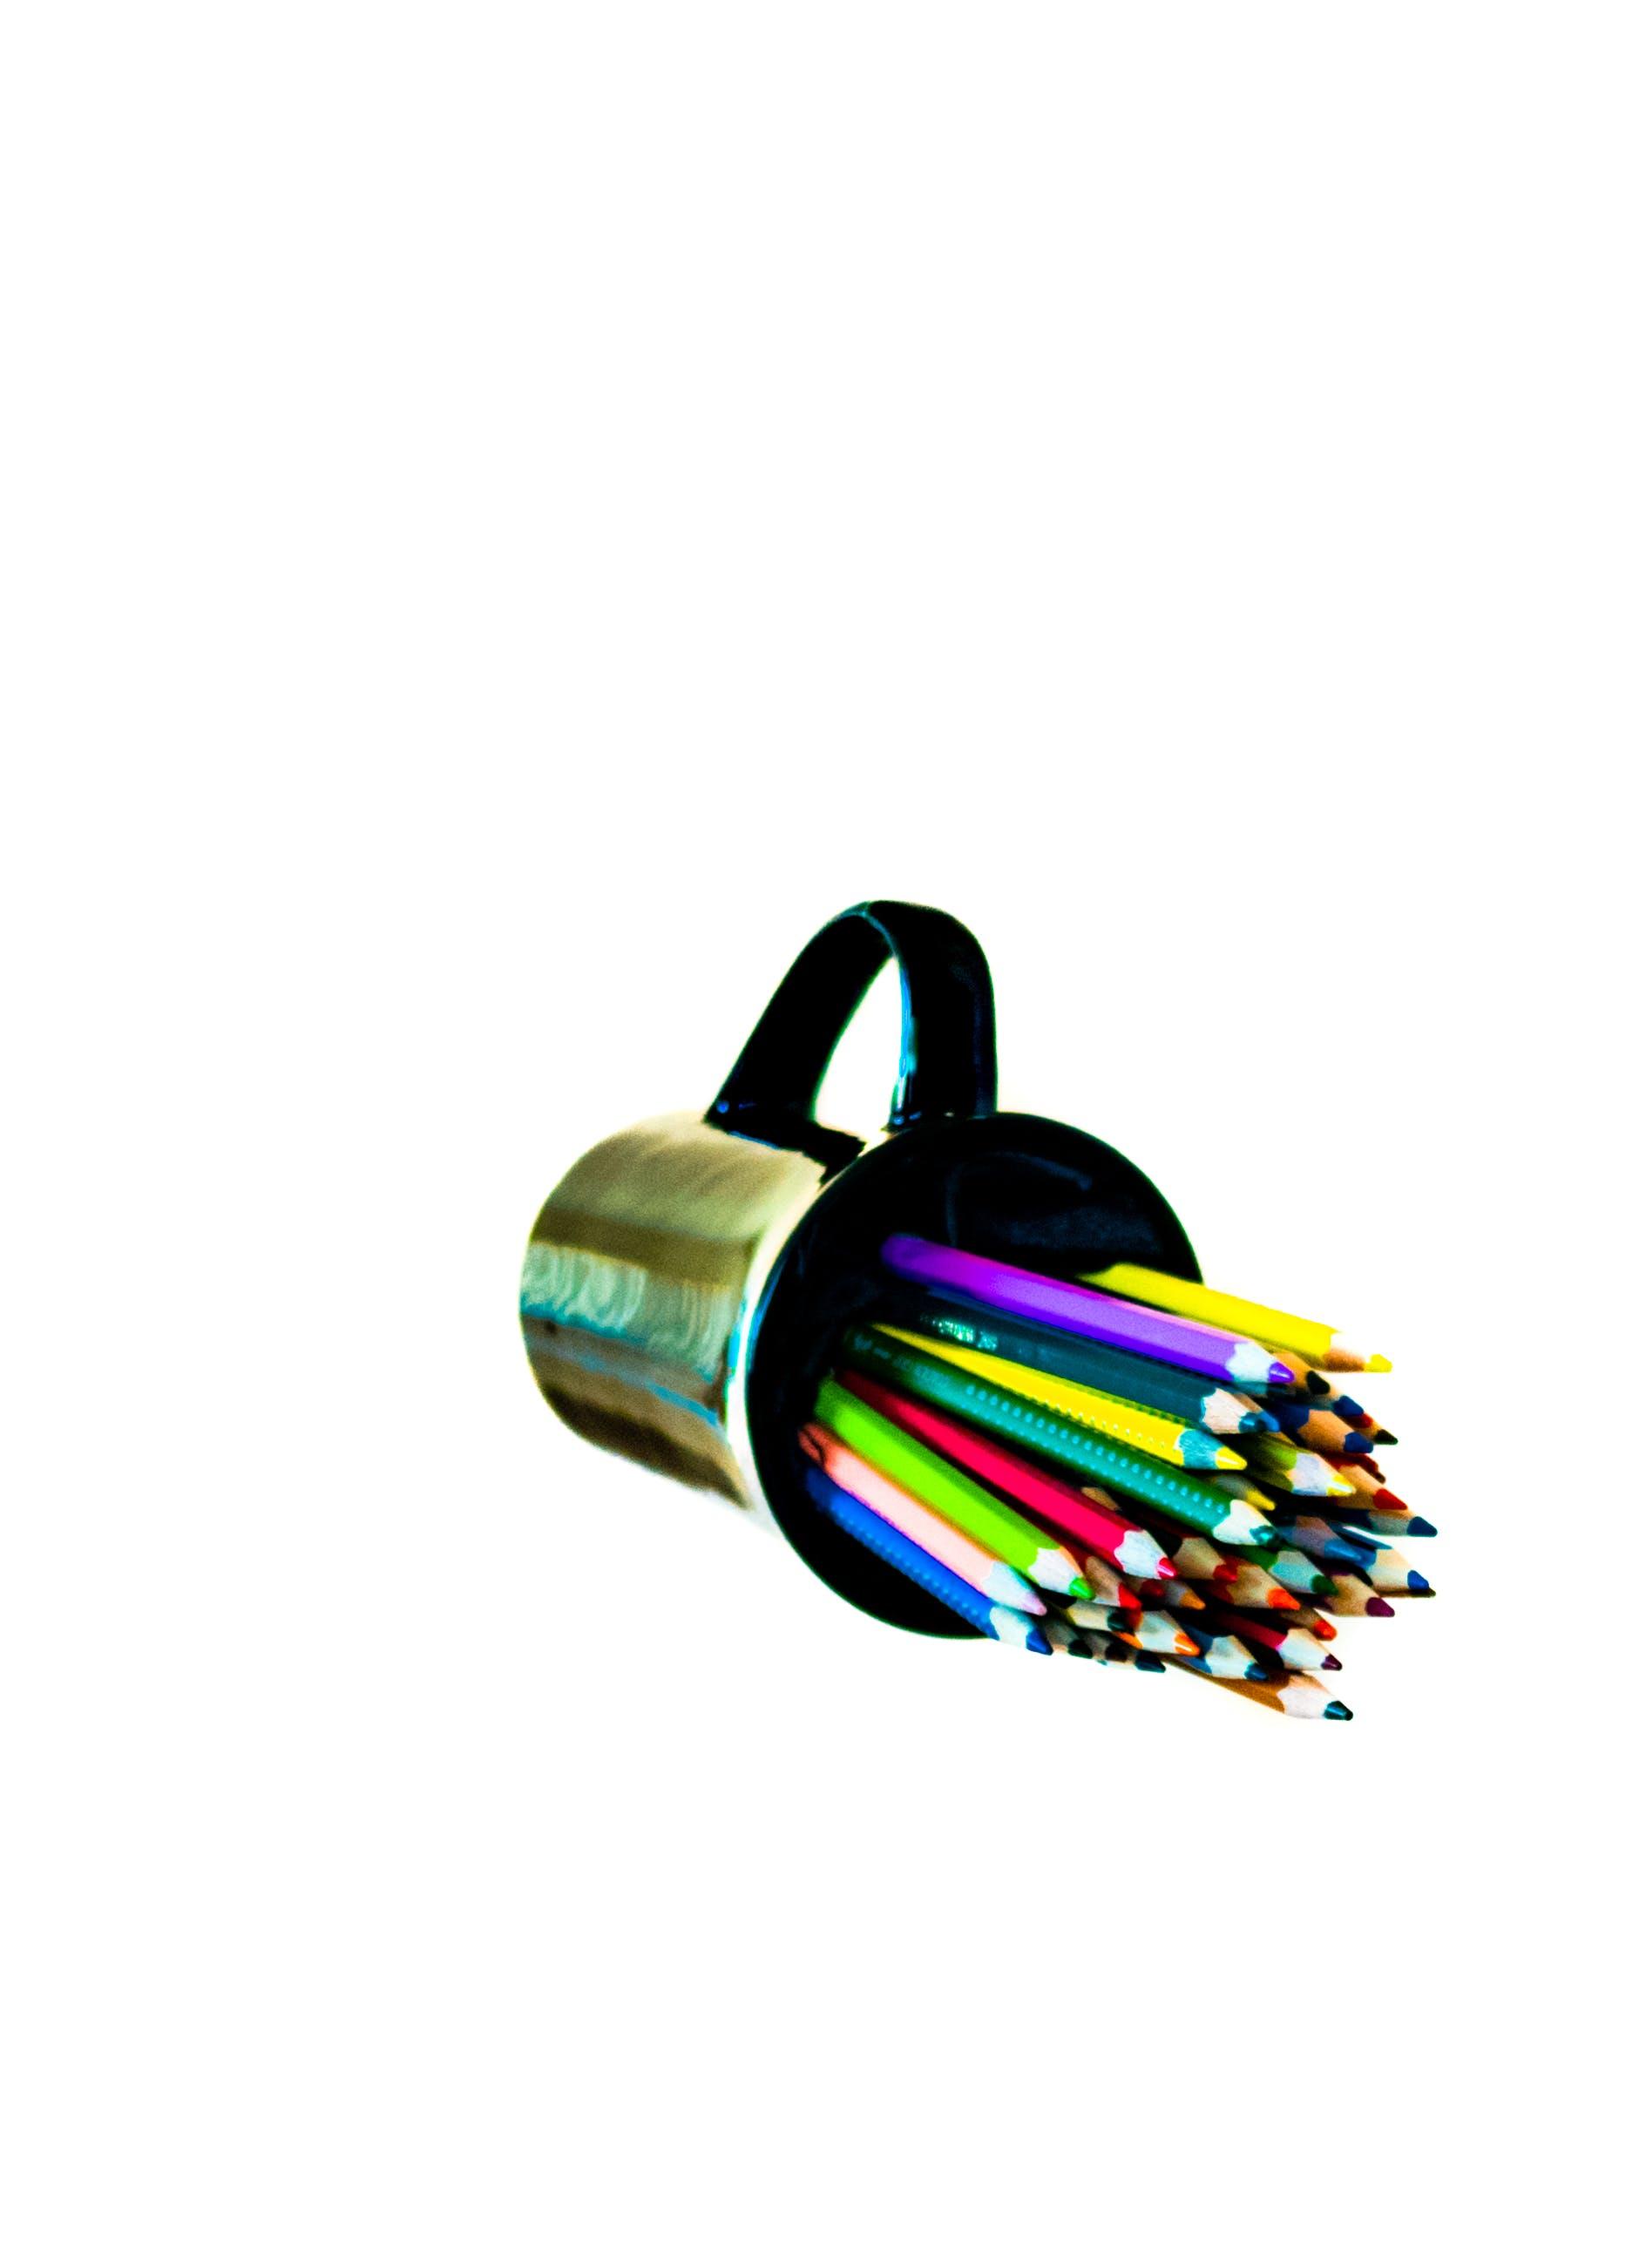 Free stock photo of black mug, coffee mug, coloured pencils, contrast